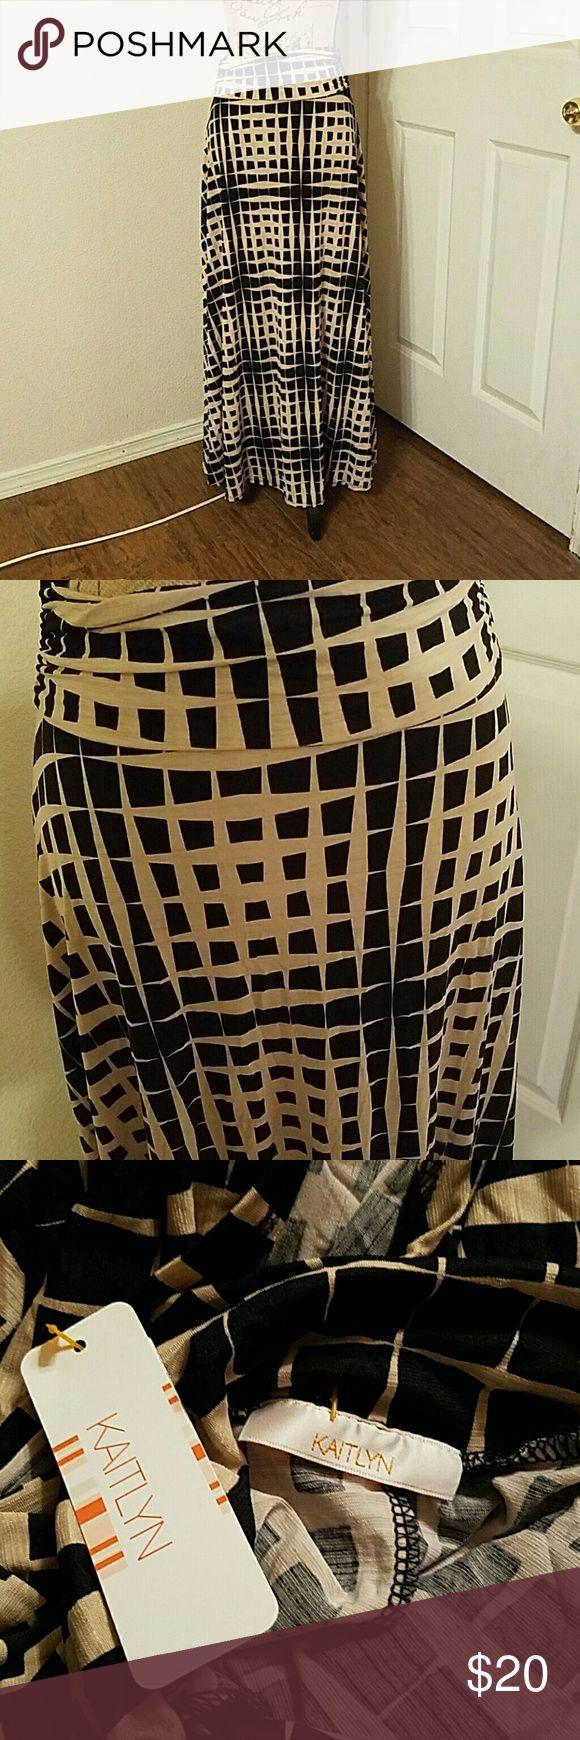 KAITLYN  MAXI SKIRT beige and black maxi skirt, stretchable fabric kaitlyn Skirts Maxi